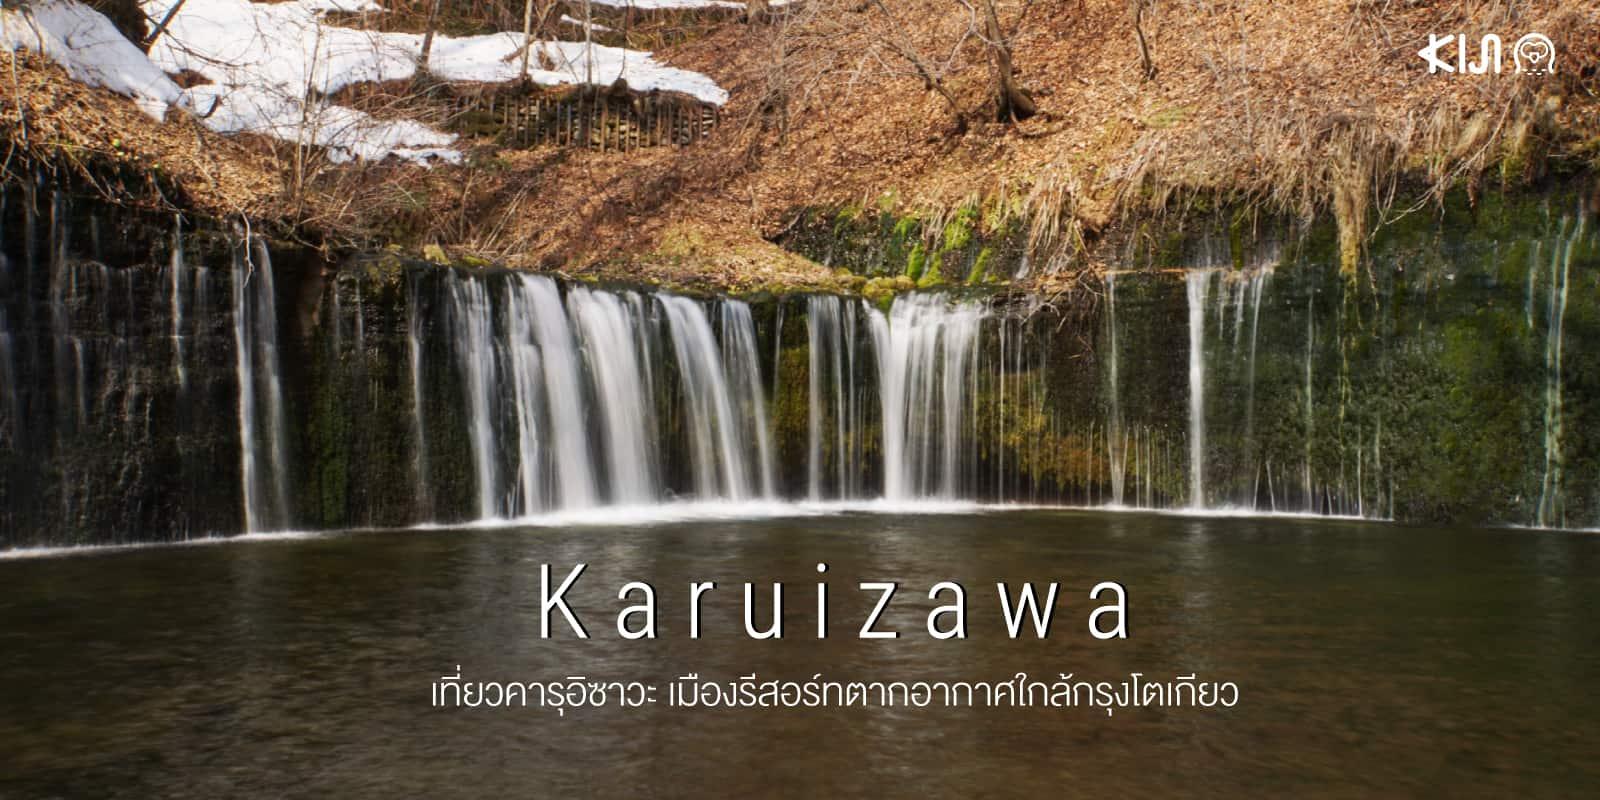 Karuizawa เที่ยวคารุอิซาวะ ใกล้กรุงโตเกียว